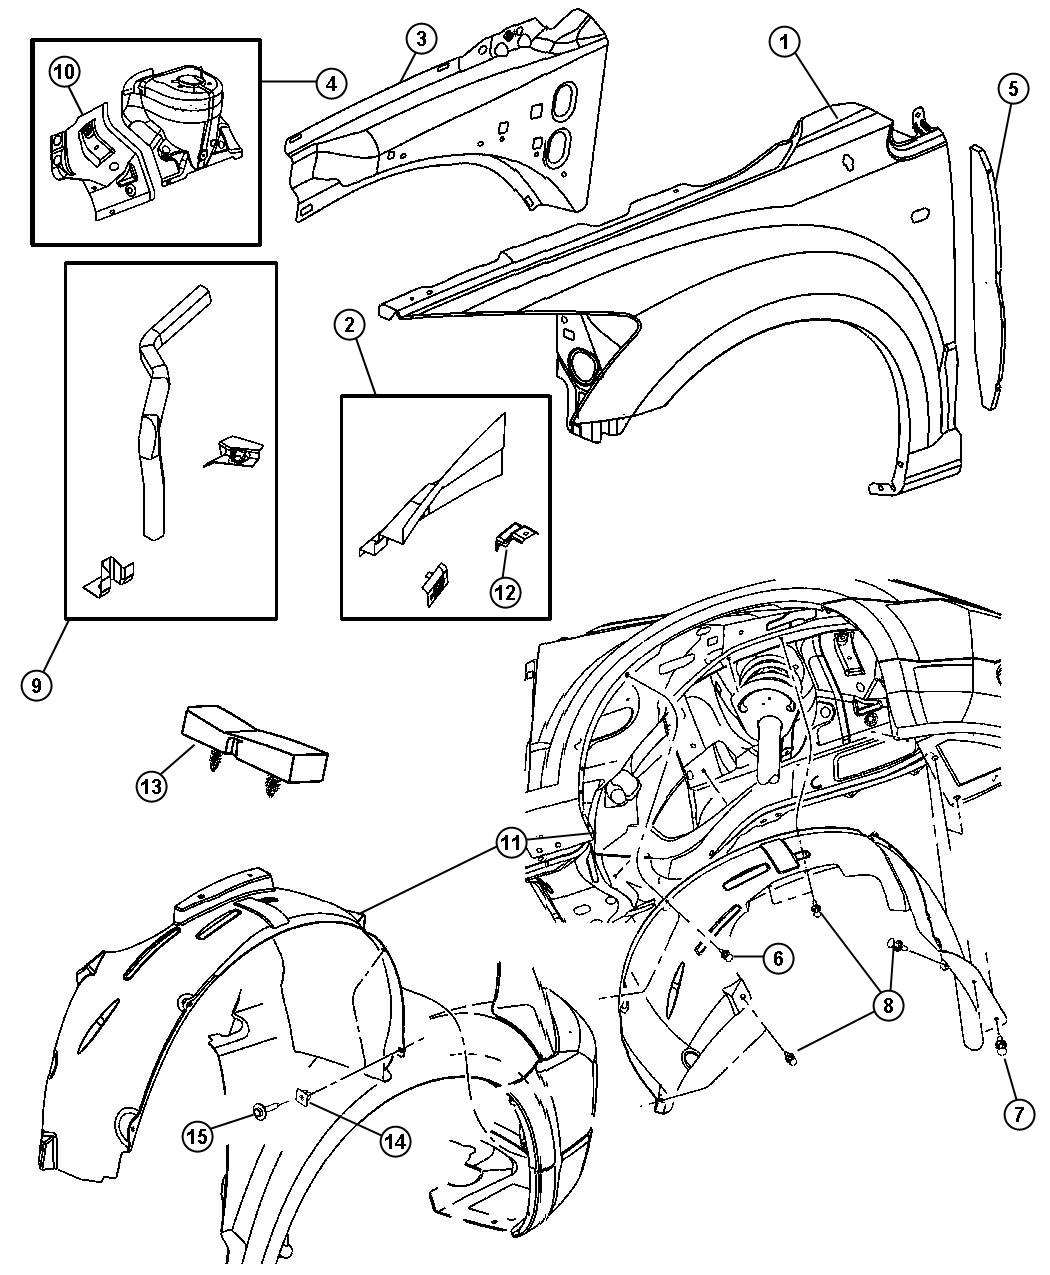 2013 Dodge Charger Se 3 6l V6 Pin  Push Pin  M8x10 3  Left  Right  Trim   No Description